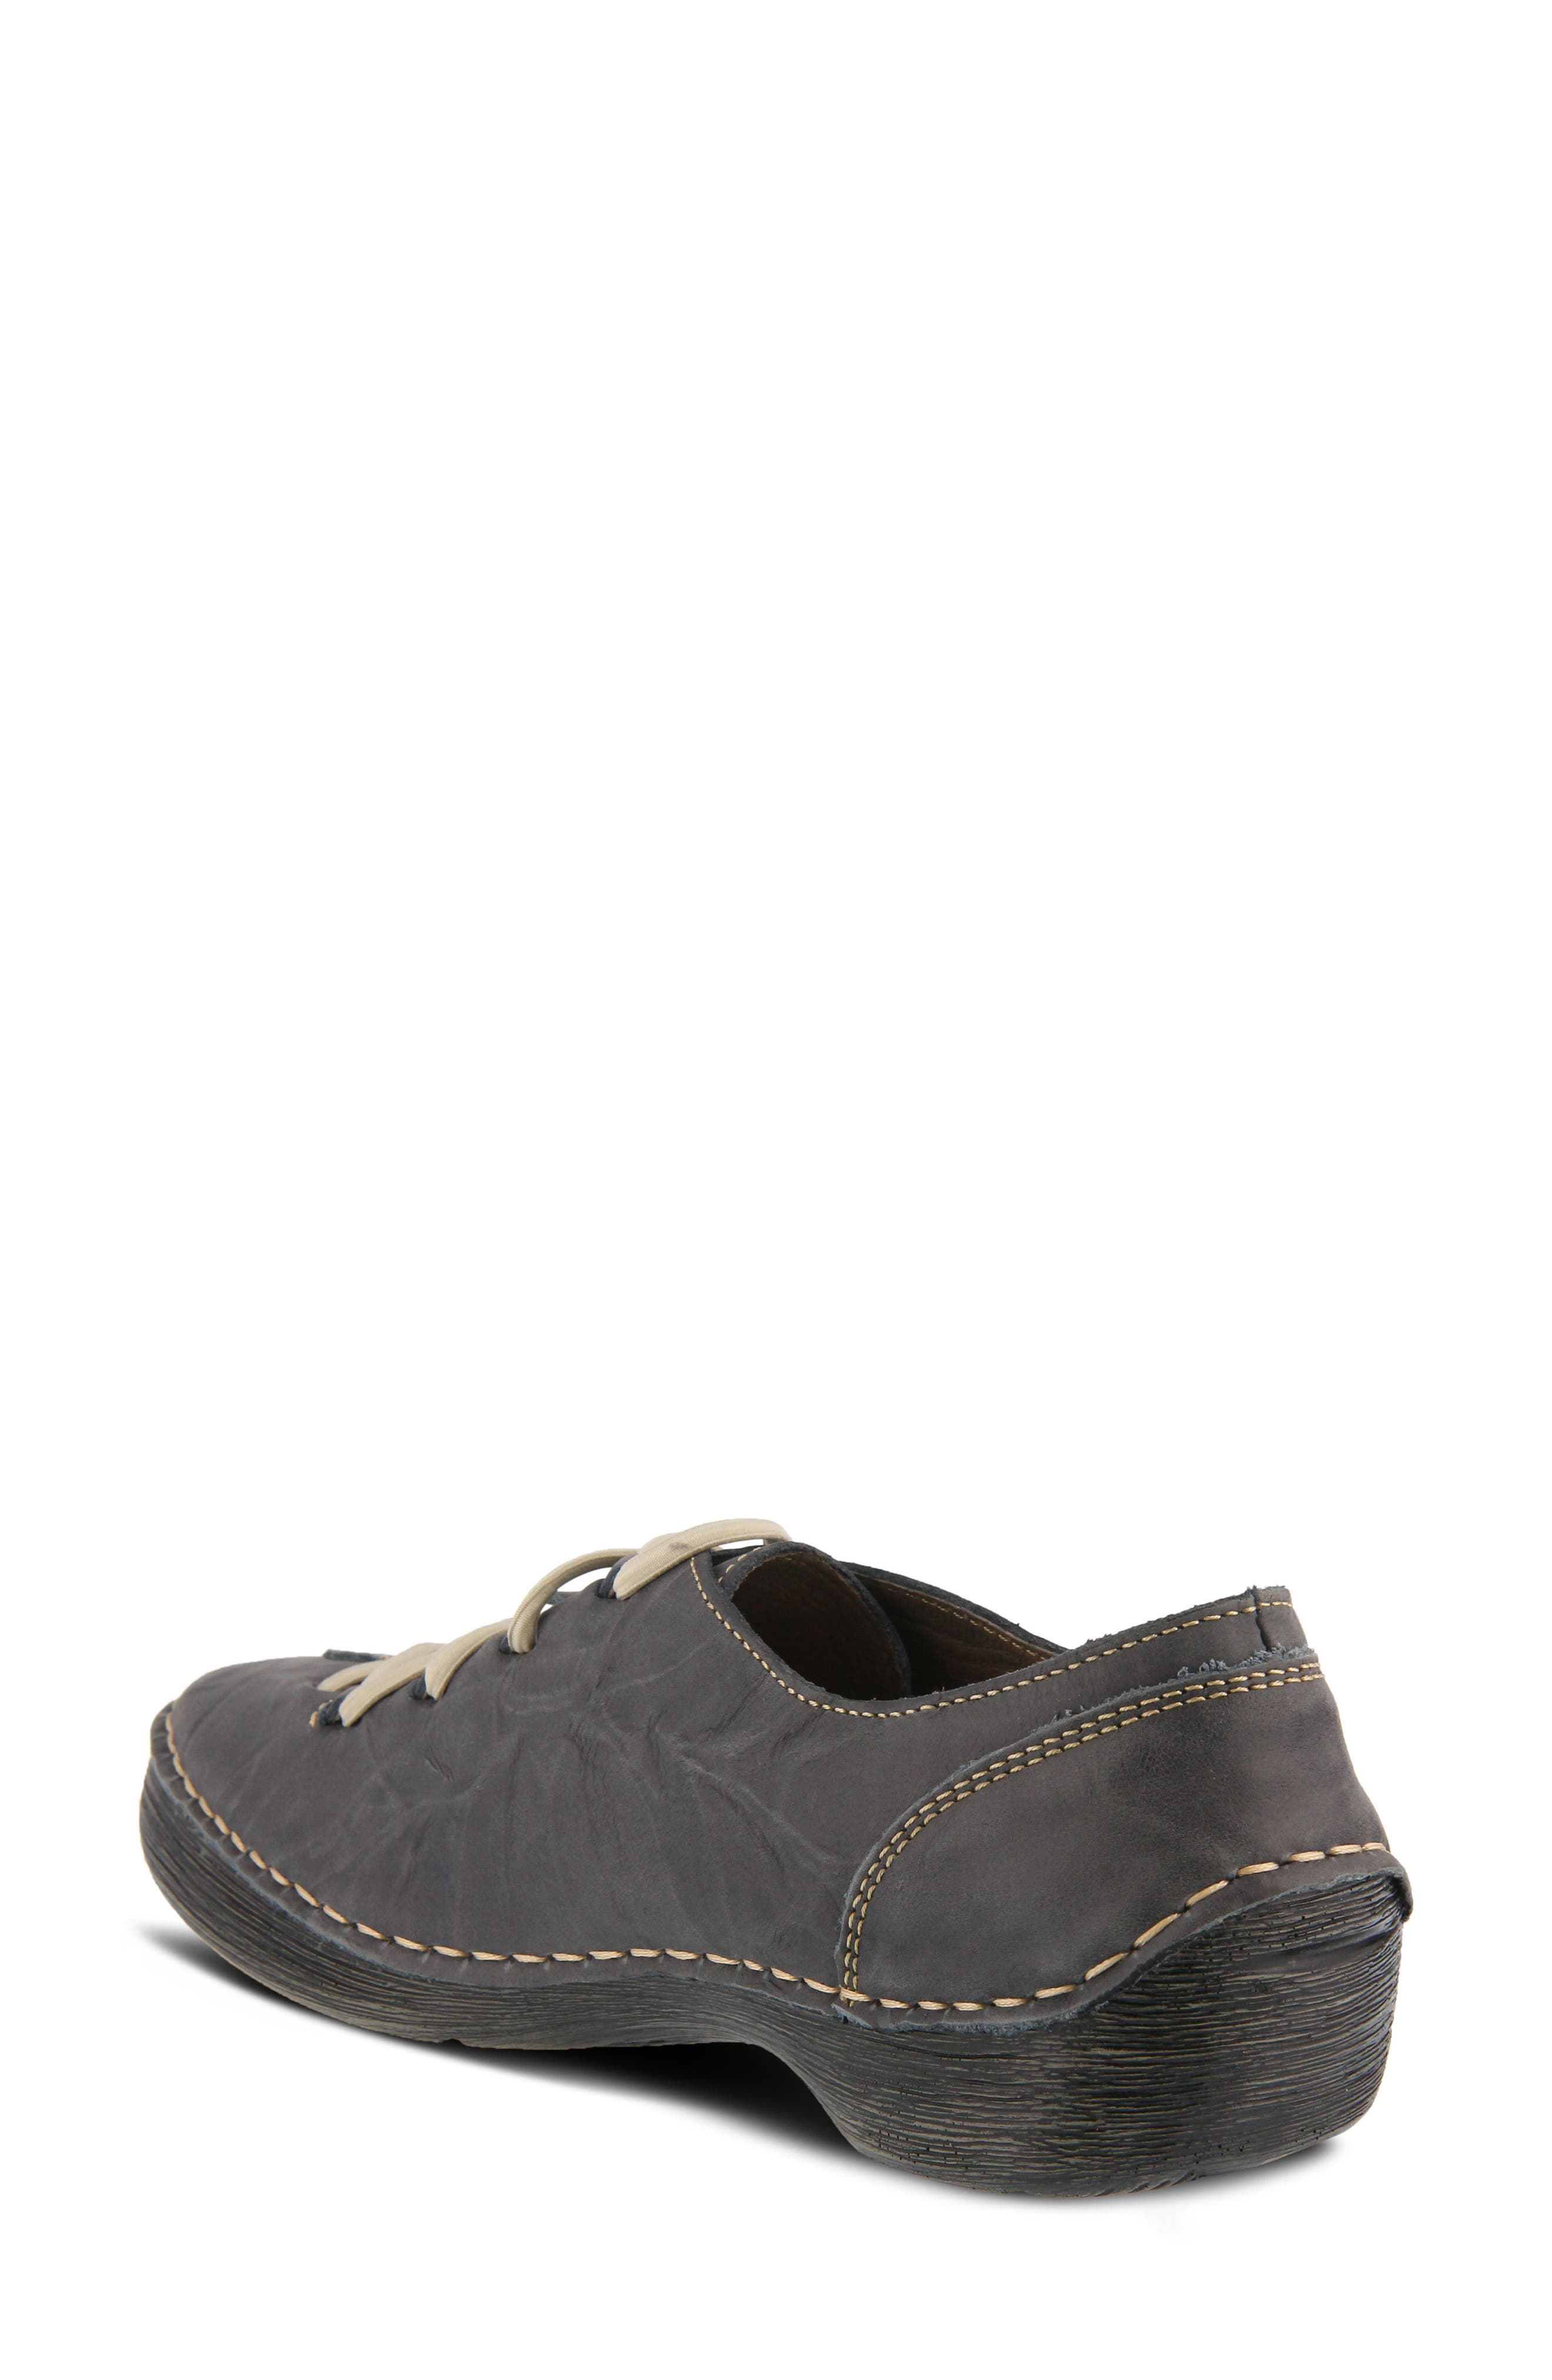 Carhop Sneaker,                             Alternate thumbnail 2, color,                             Blue Leather